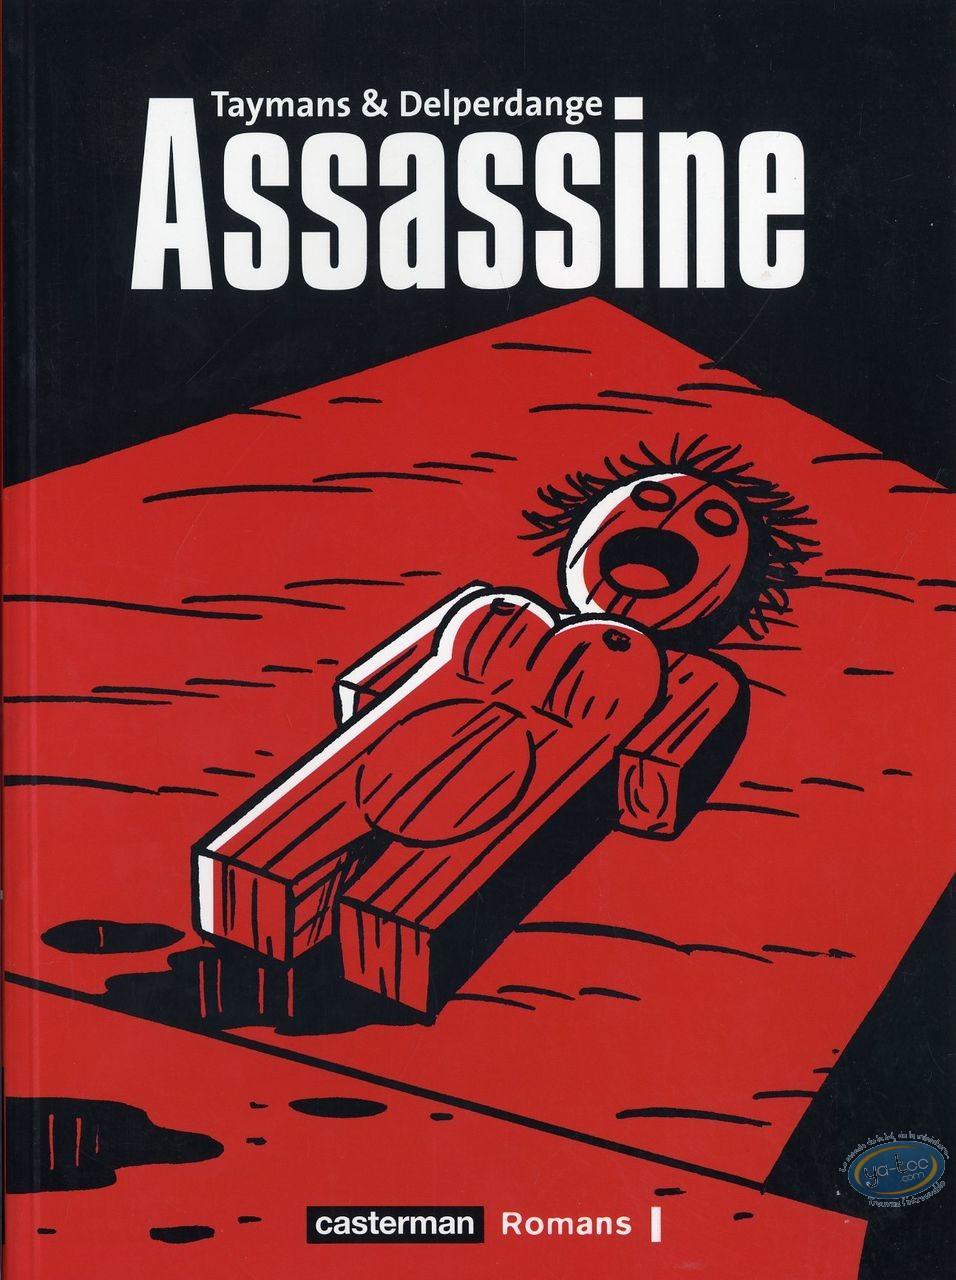 BD prix mini, Assassine : Assassine